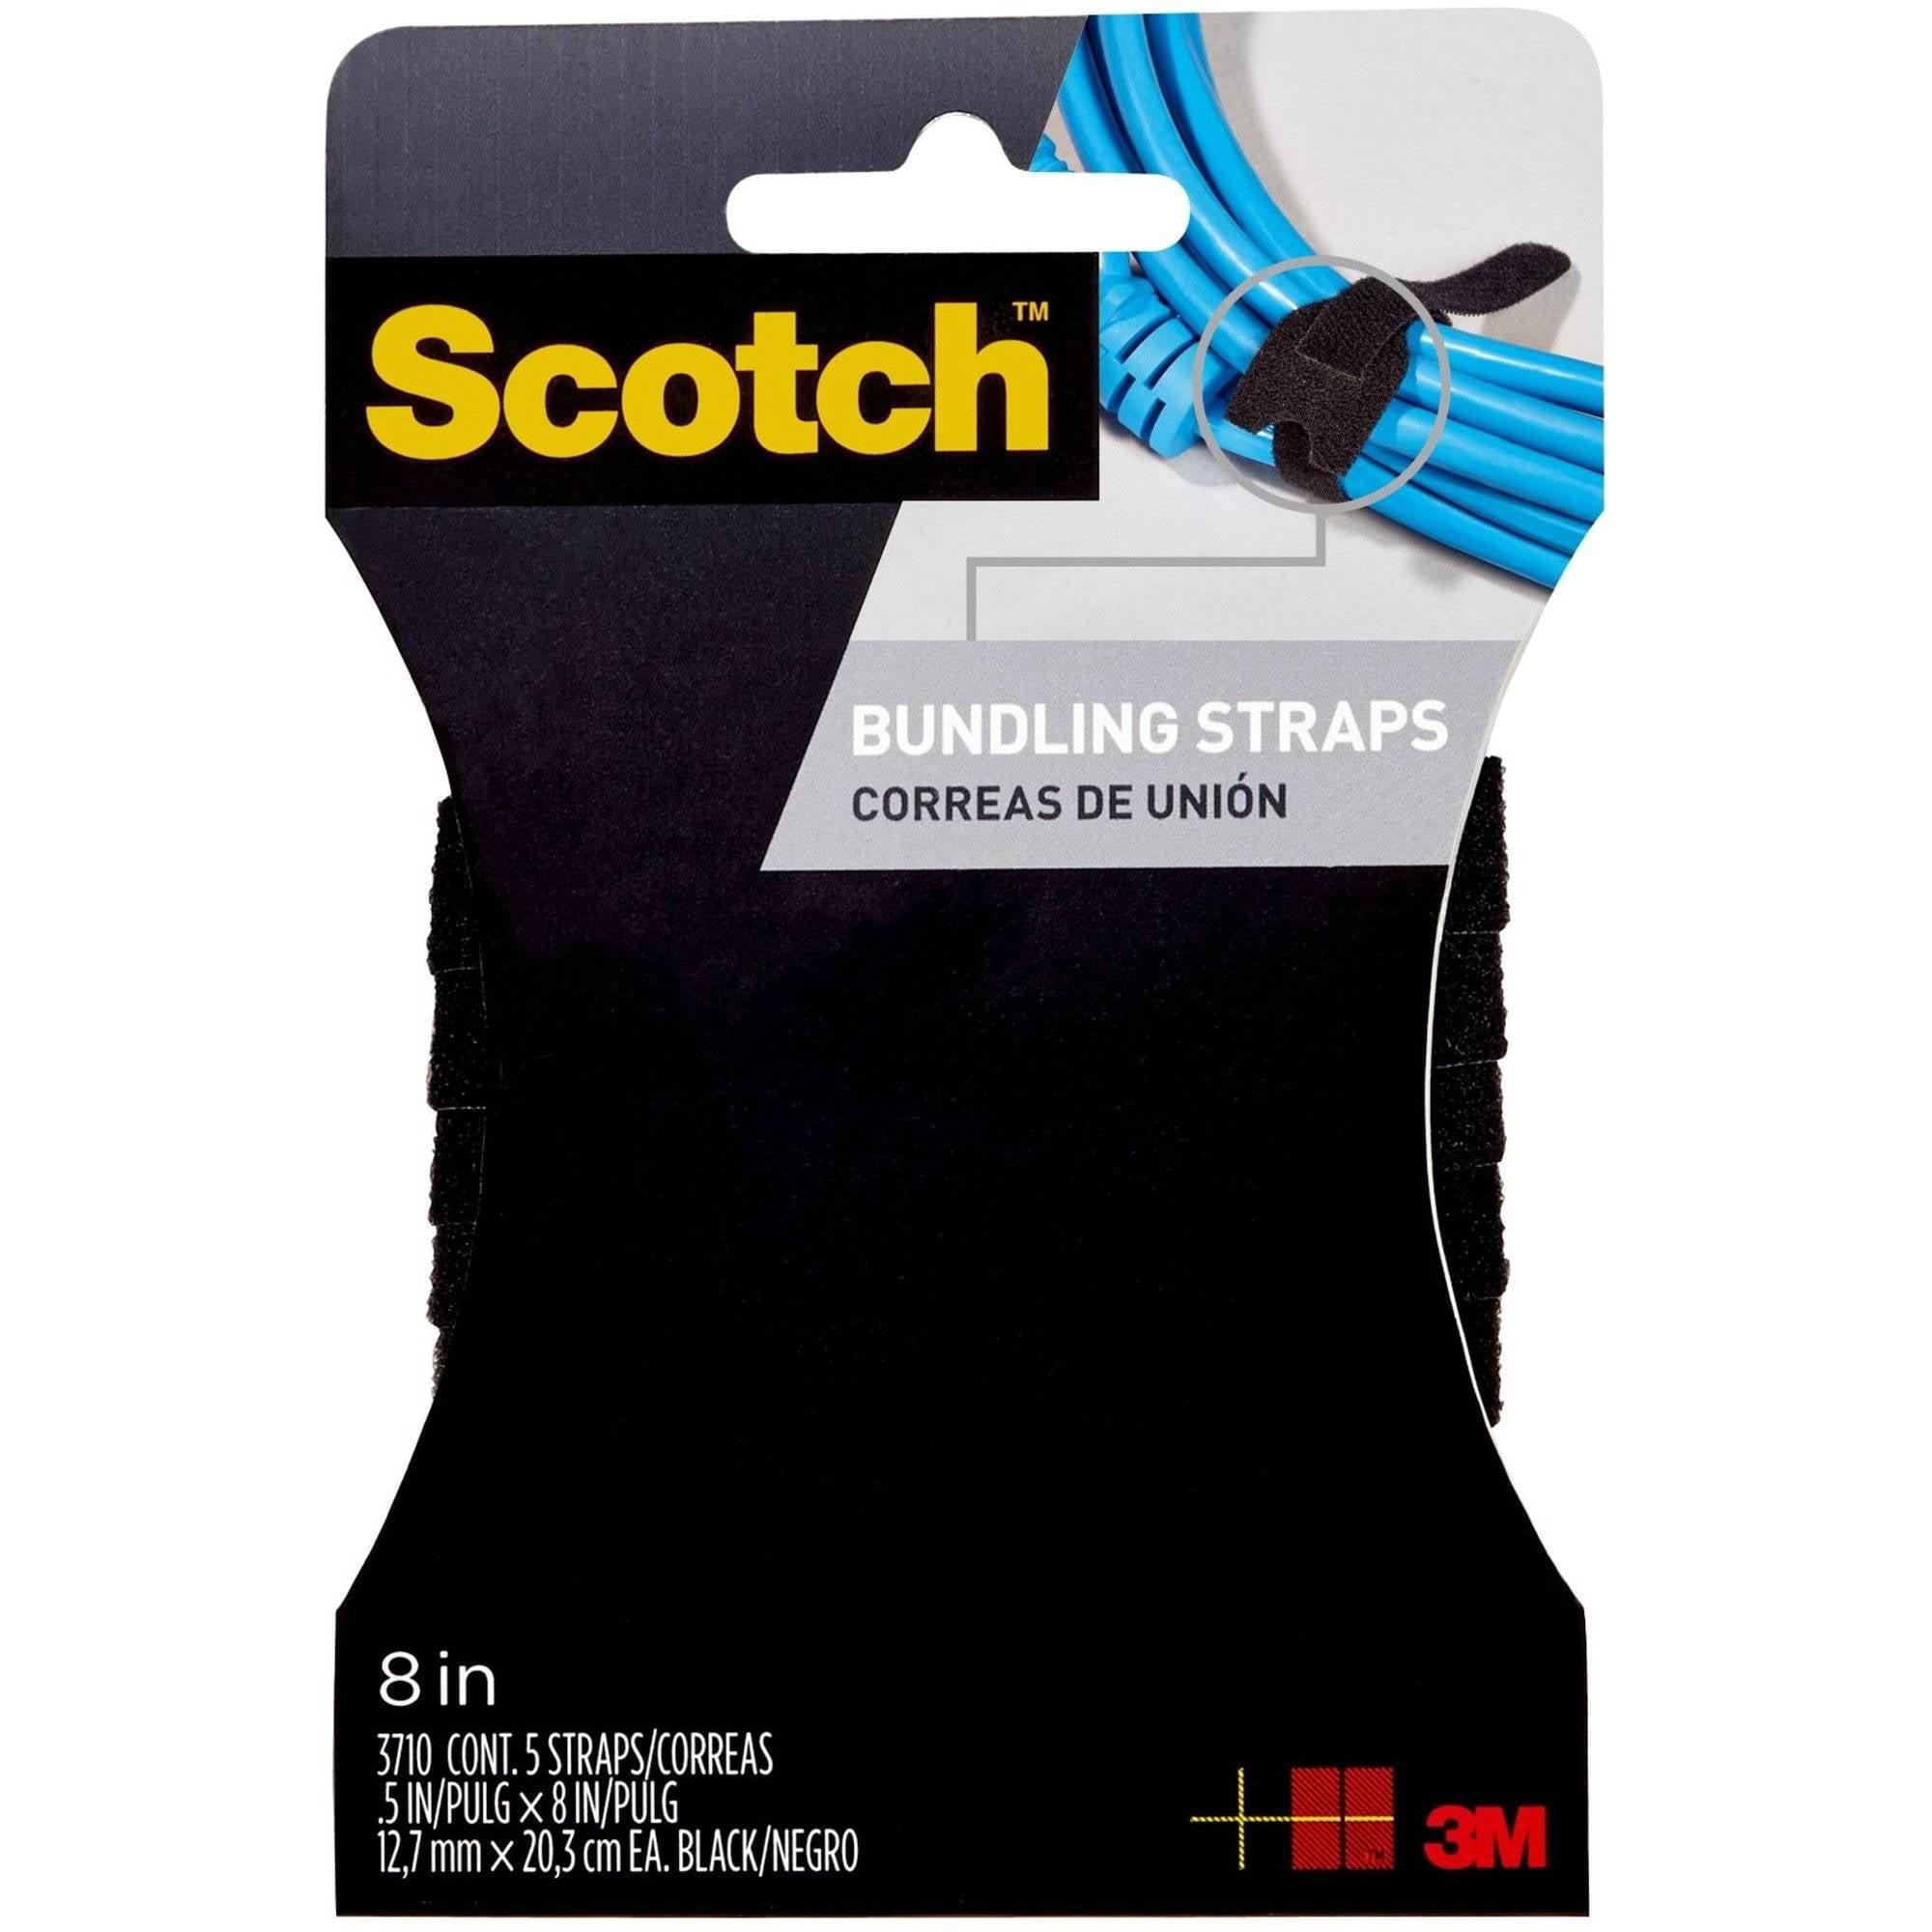 Scotch Bundling Straps, 0.5 in. x 8 in., Black, 6/Pack